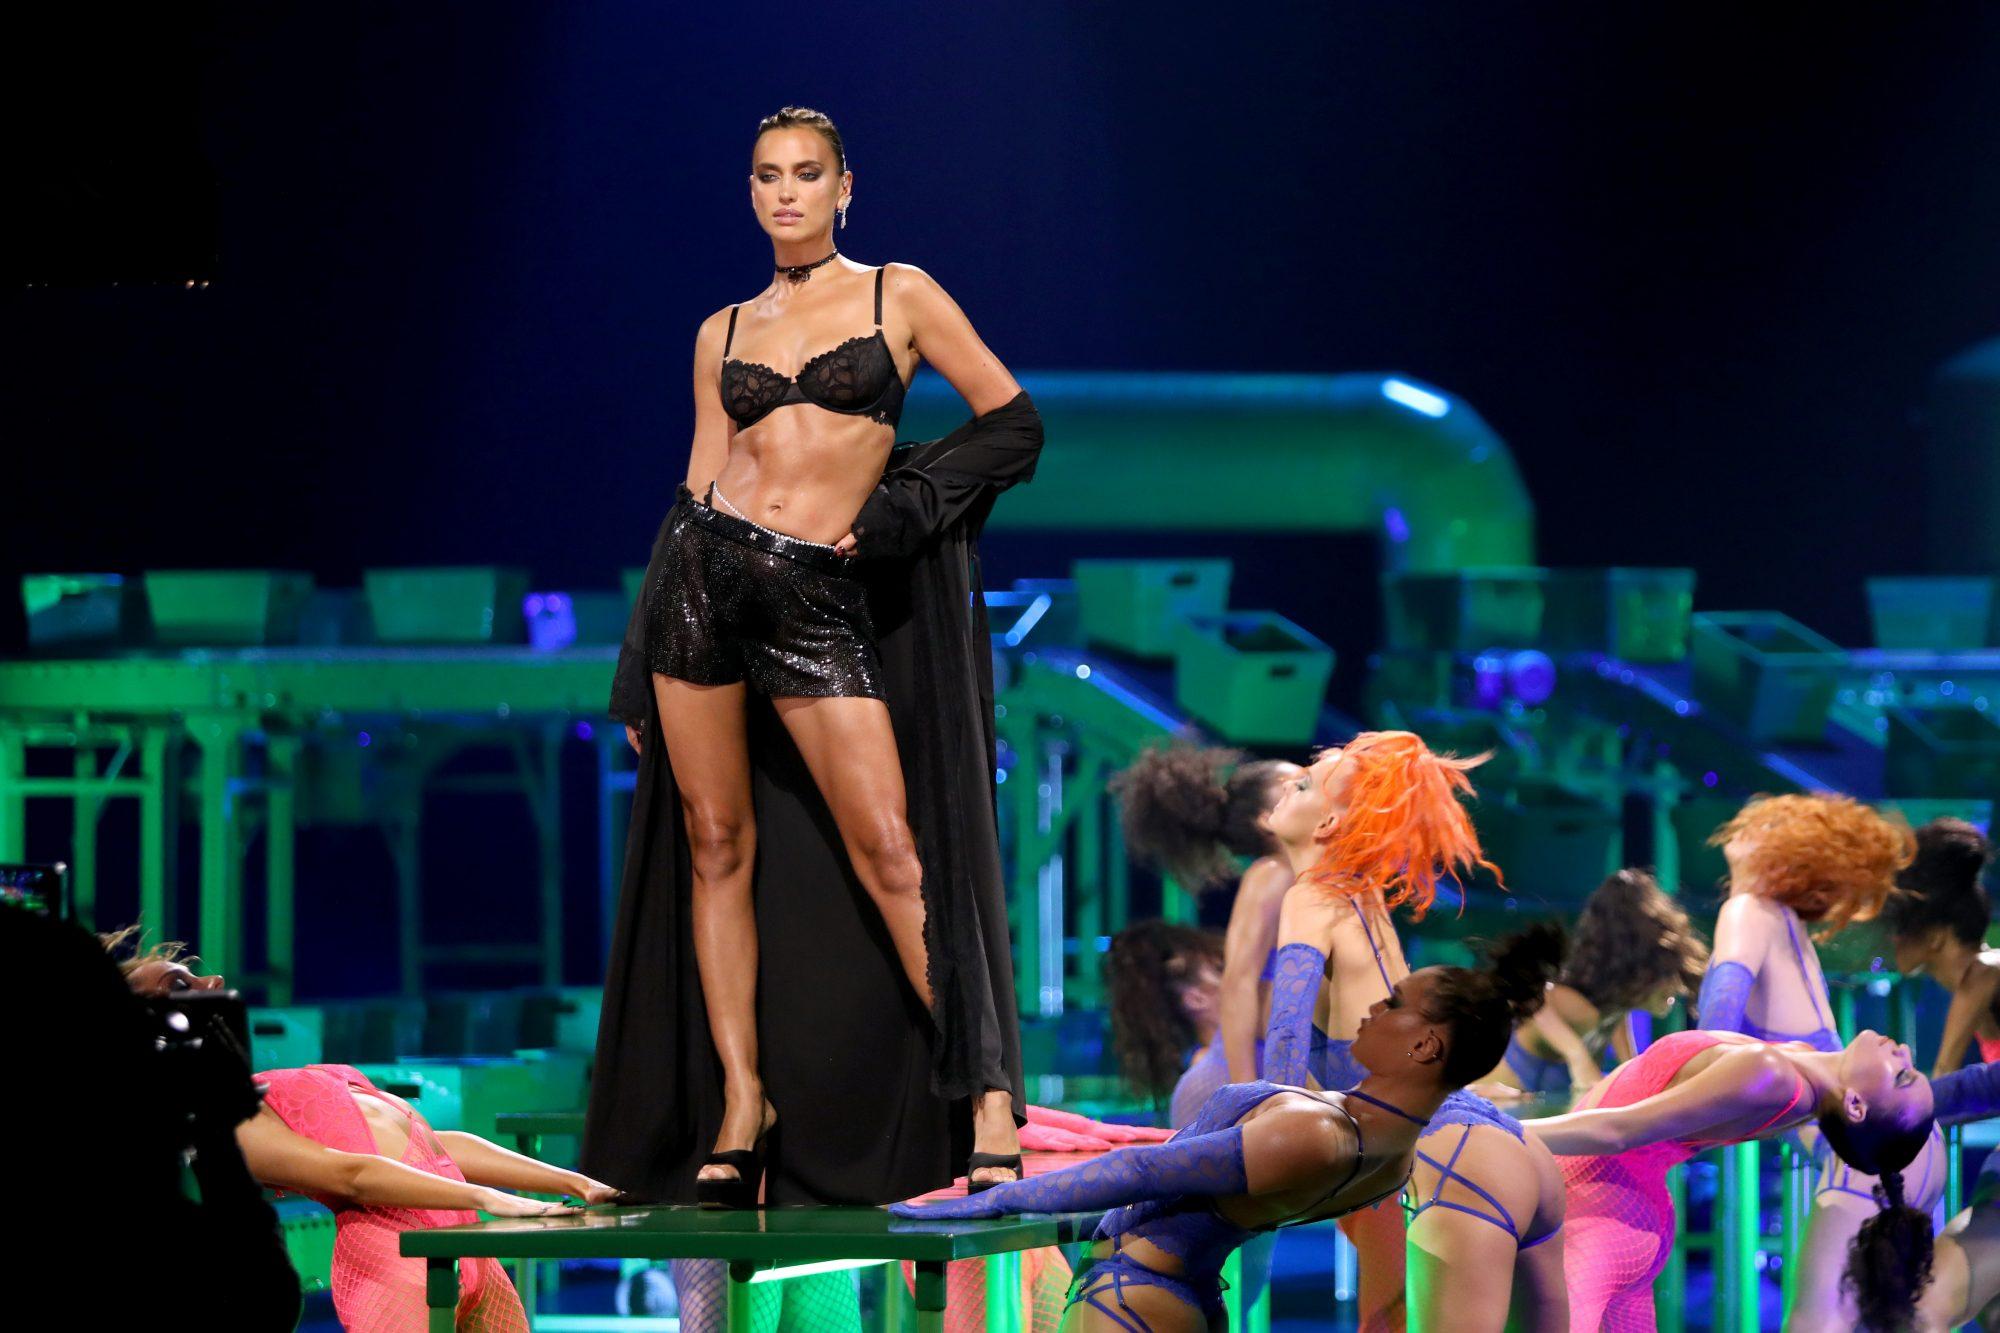 Irina Shayk en Rihanna's Savage X Fenty Show Vol. 2